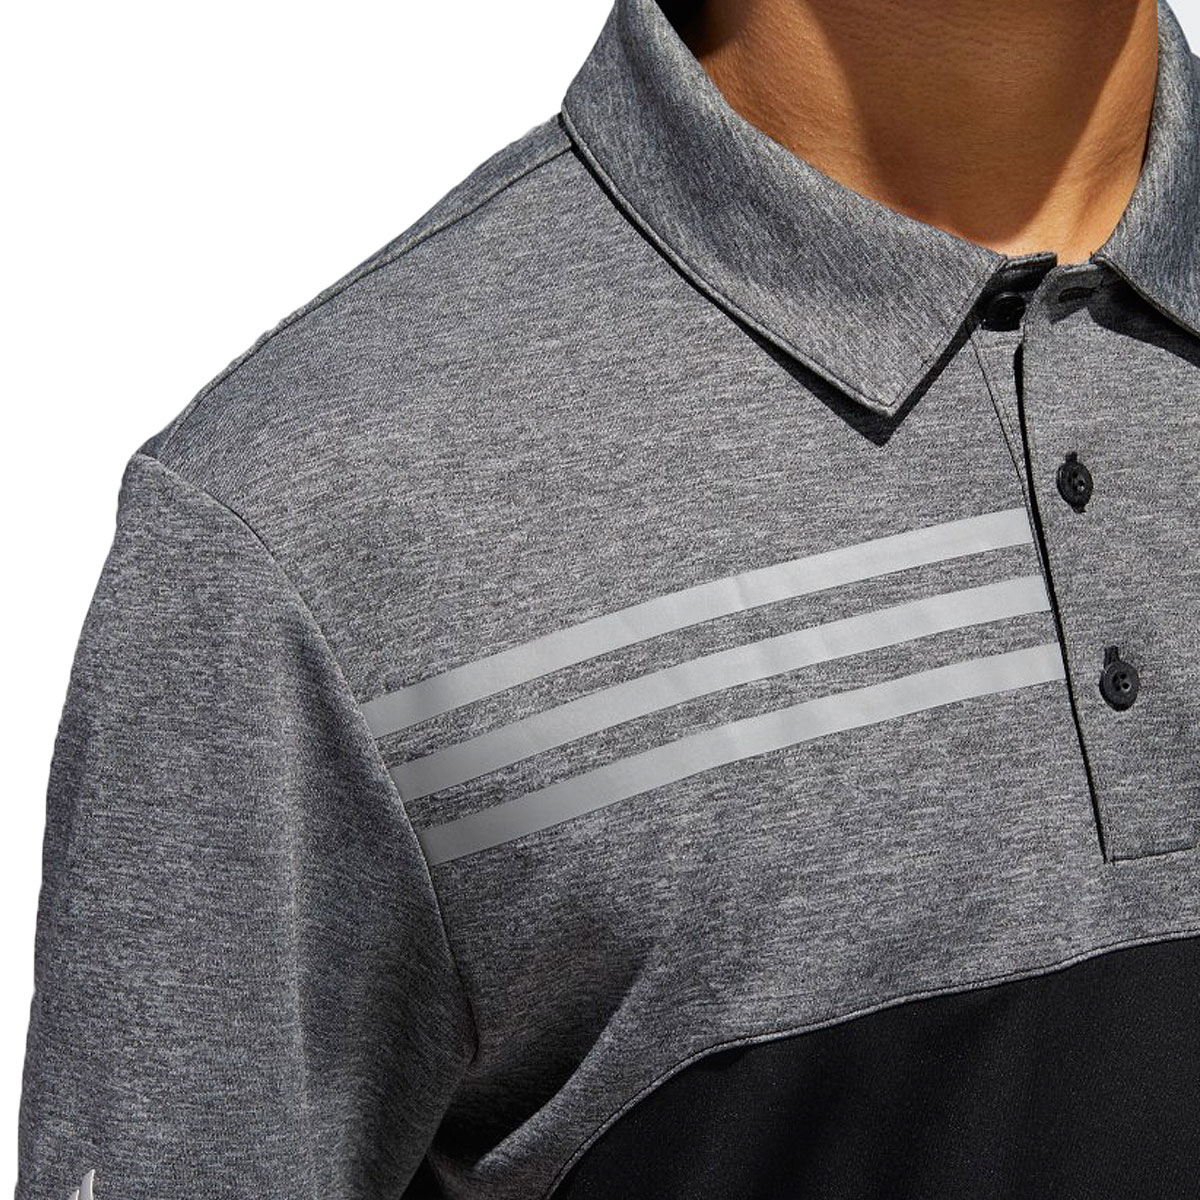 Adidas-Golf-Homme-3-Stripe-Heather-bloque-UPF-50-Polo-Shirt-43-off-RRP miniature 4